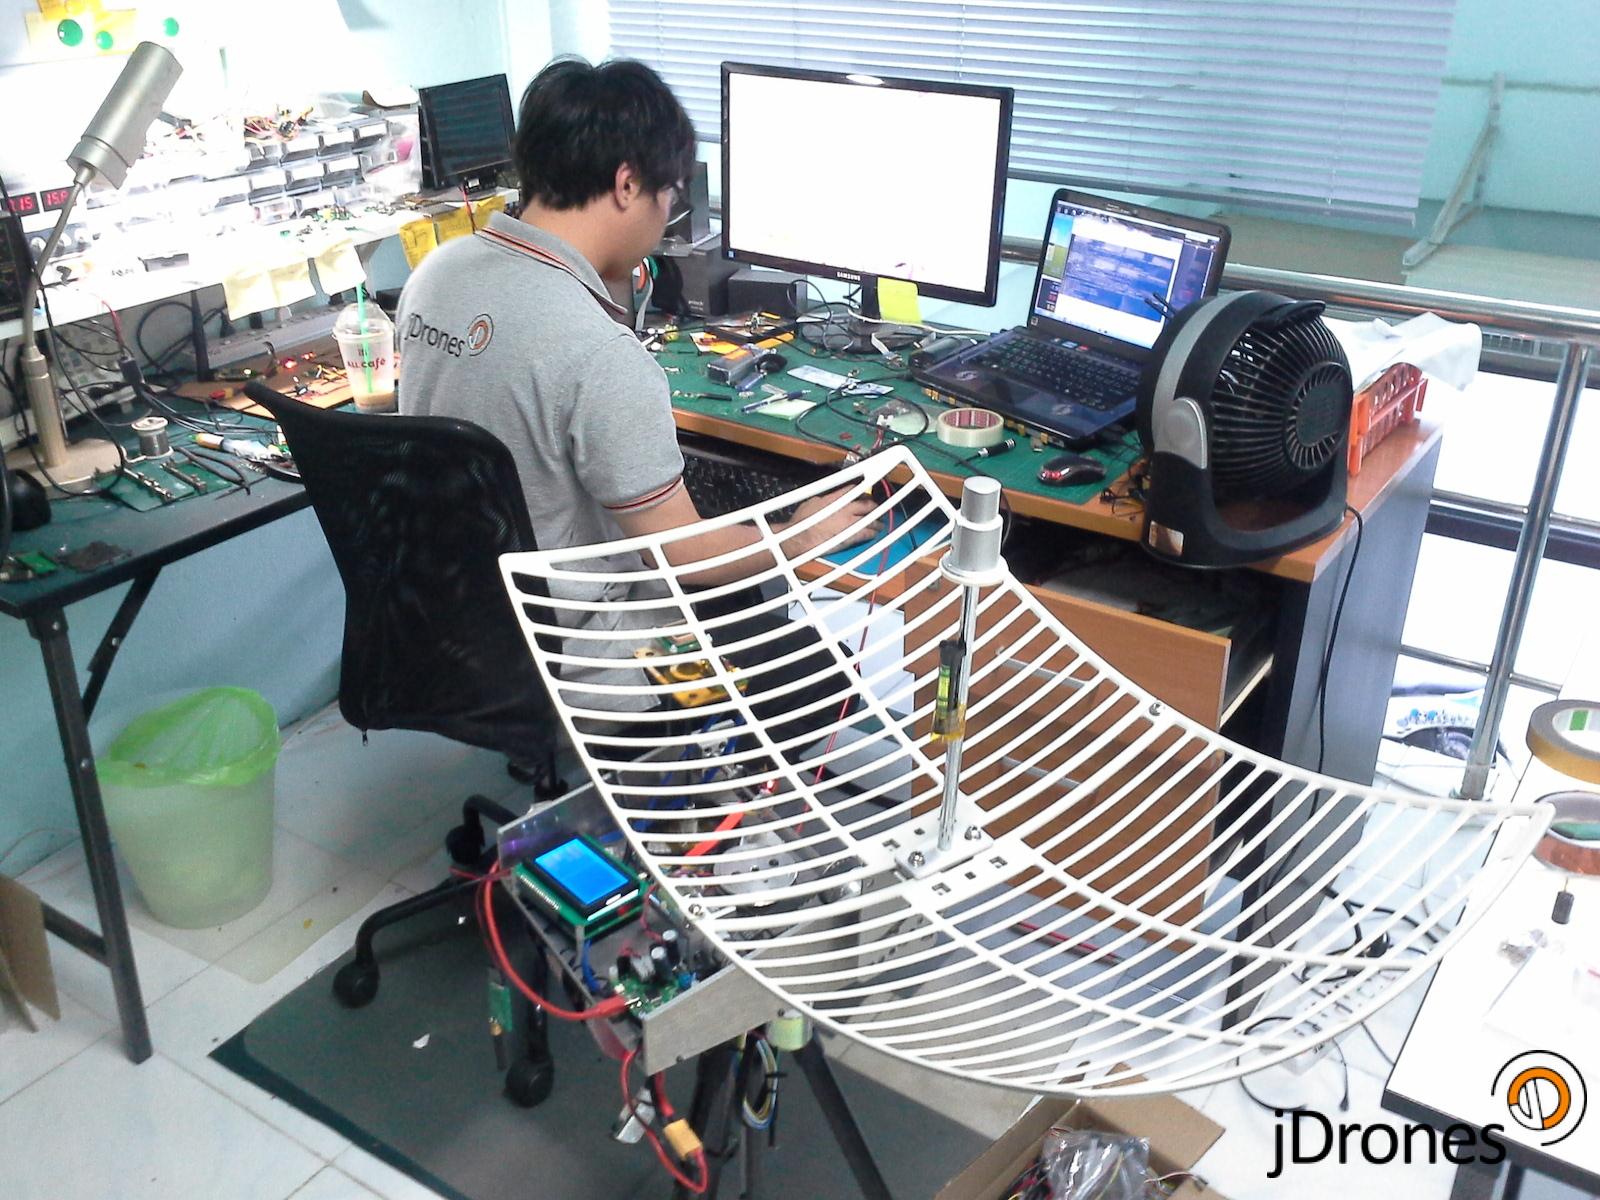 jDrones_Antenna_tracker_Development_P1.jpg?width=500